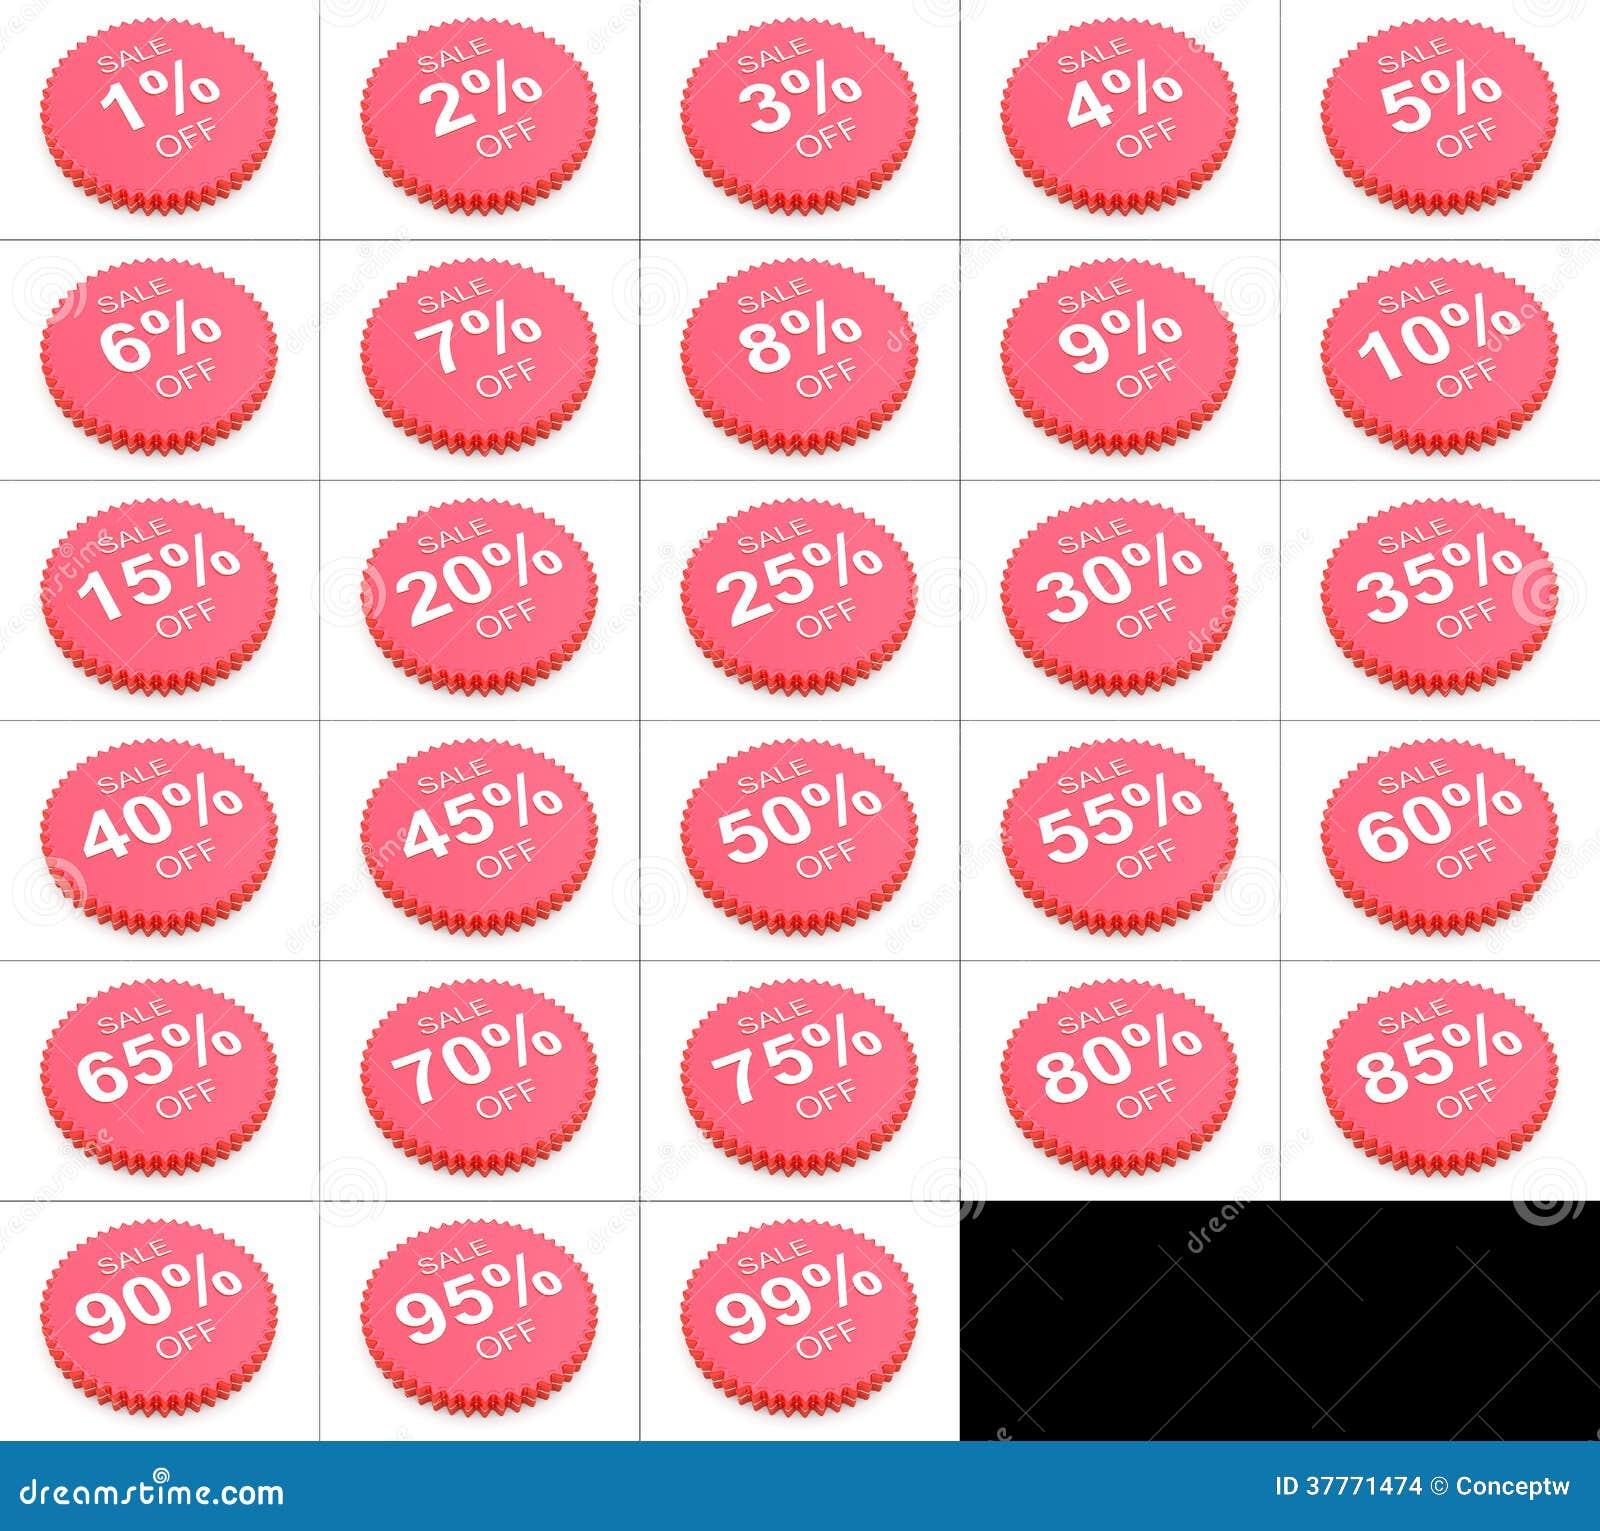 how to set processor percentage